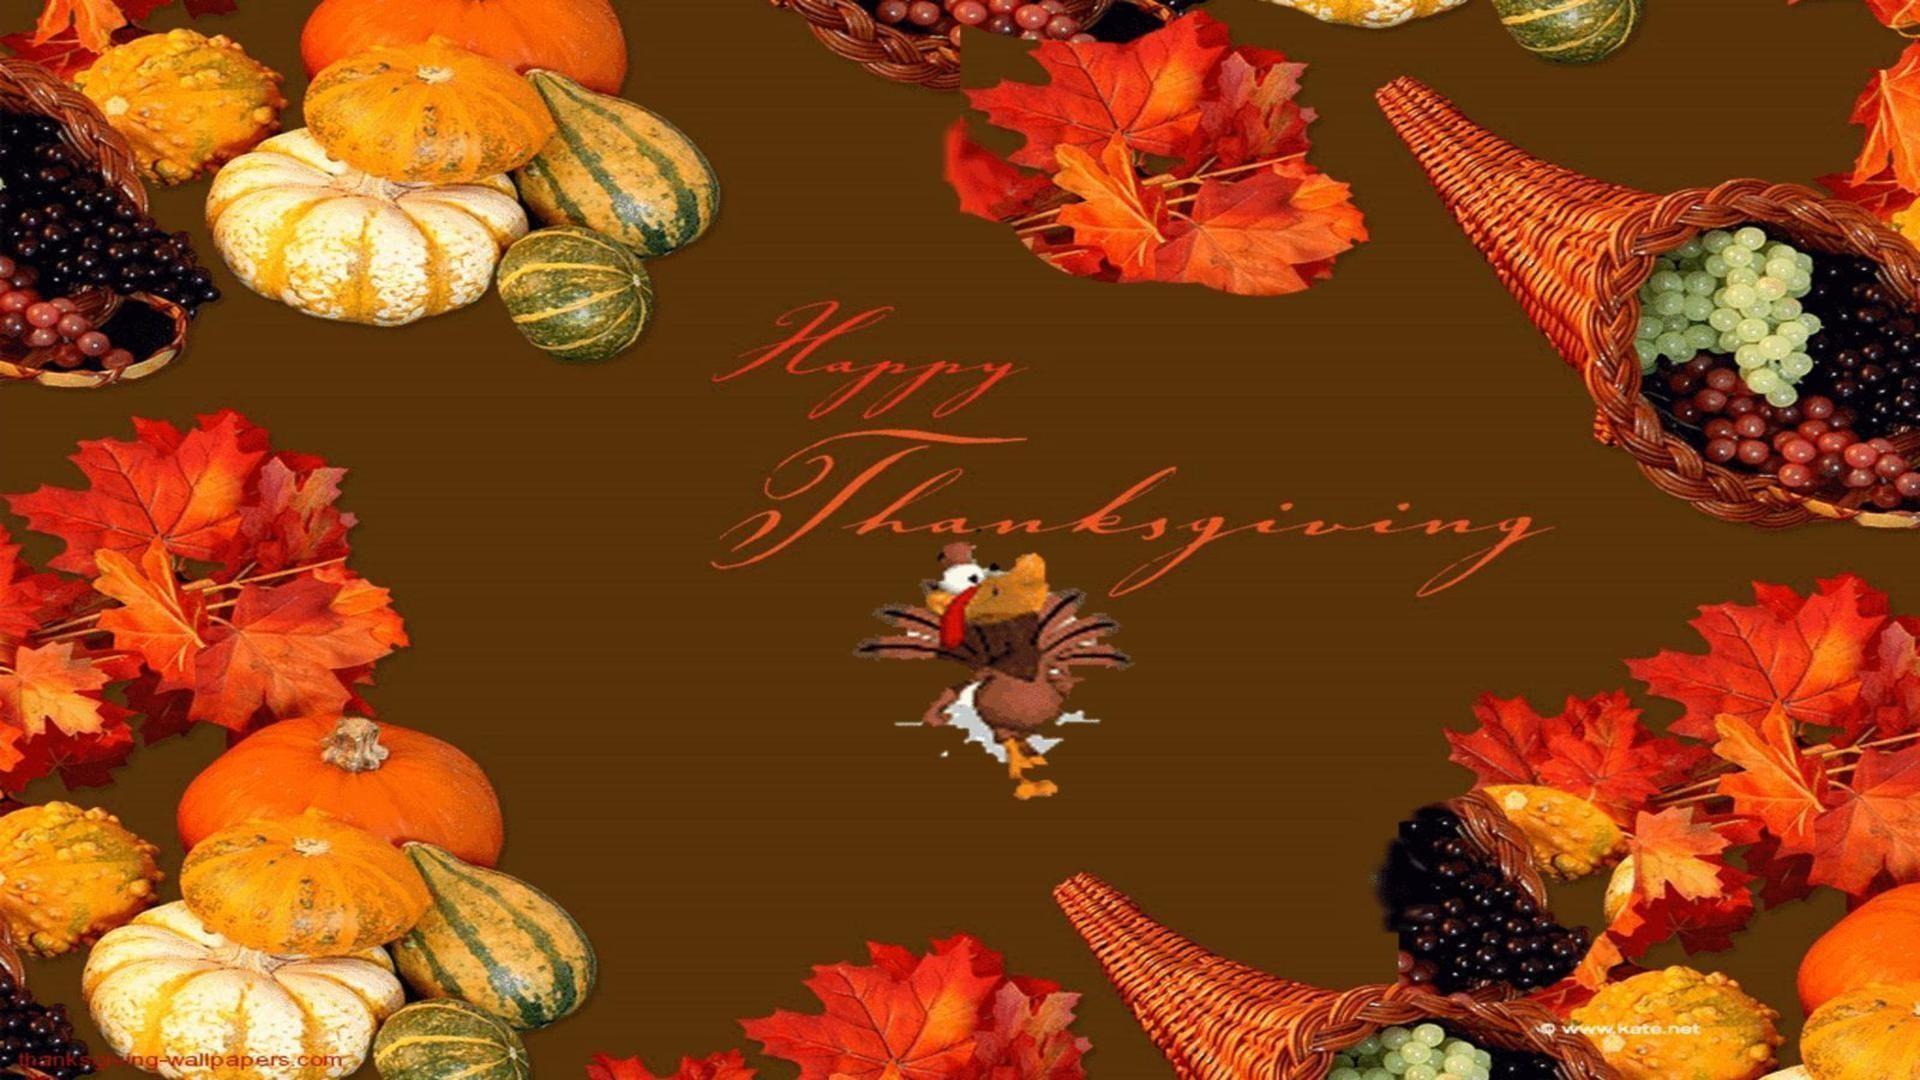 Thanksgiving Wallpaper 75 Images